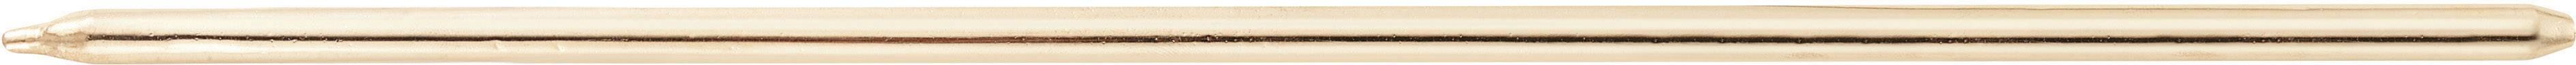 Teplovodná rúrka Gelid CP-S8350-01, (Ø x d) 8 mm x 350 mm, meď, voda